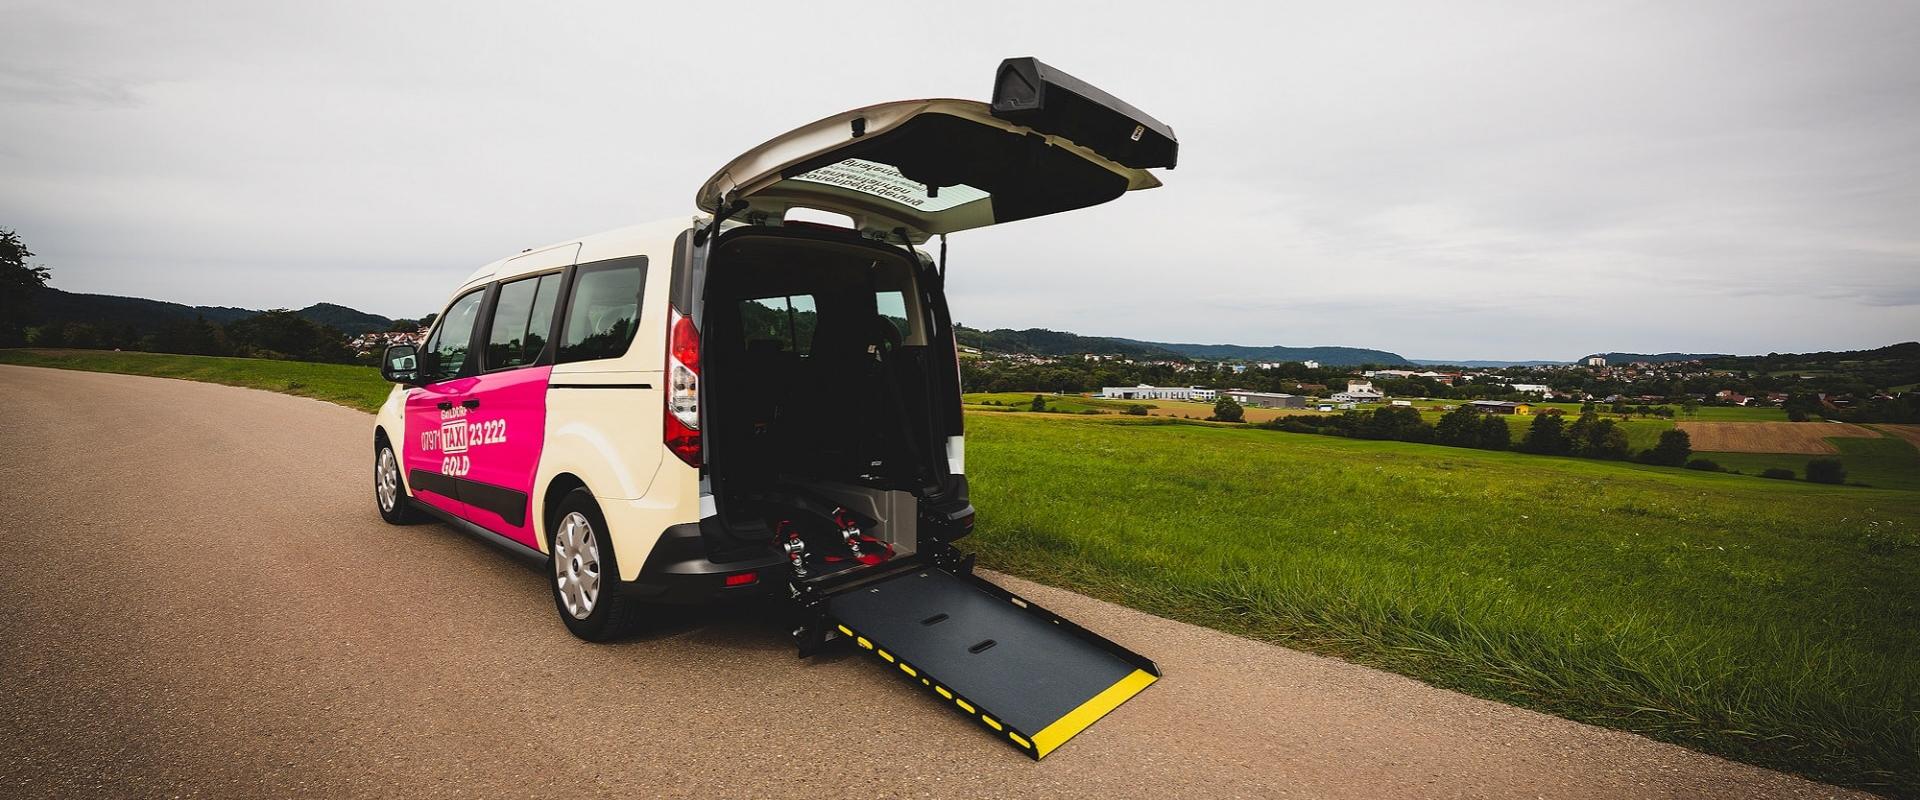 Taxi Gold Krankentransporte in Gaildorf